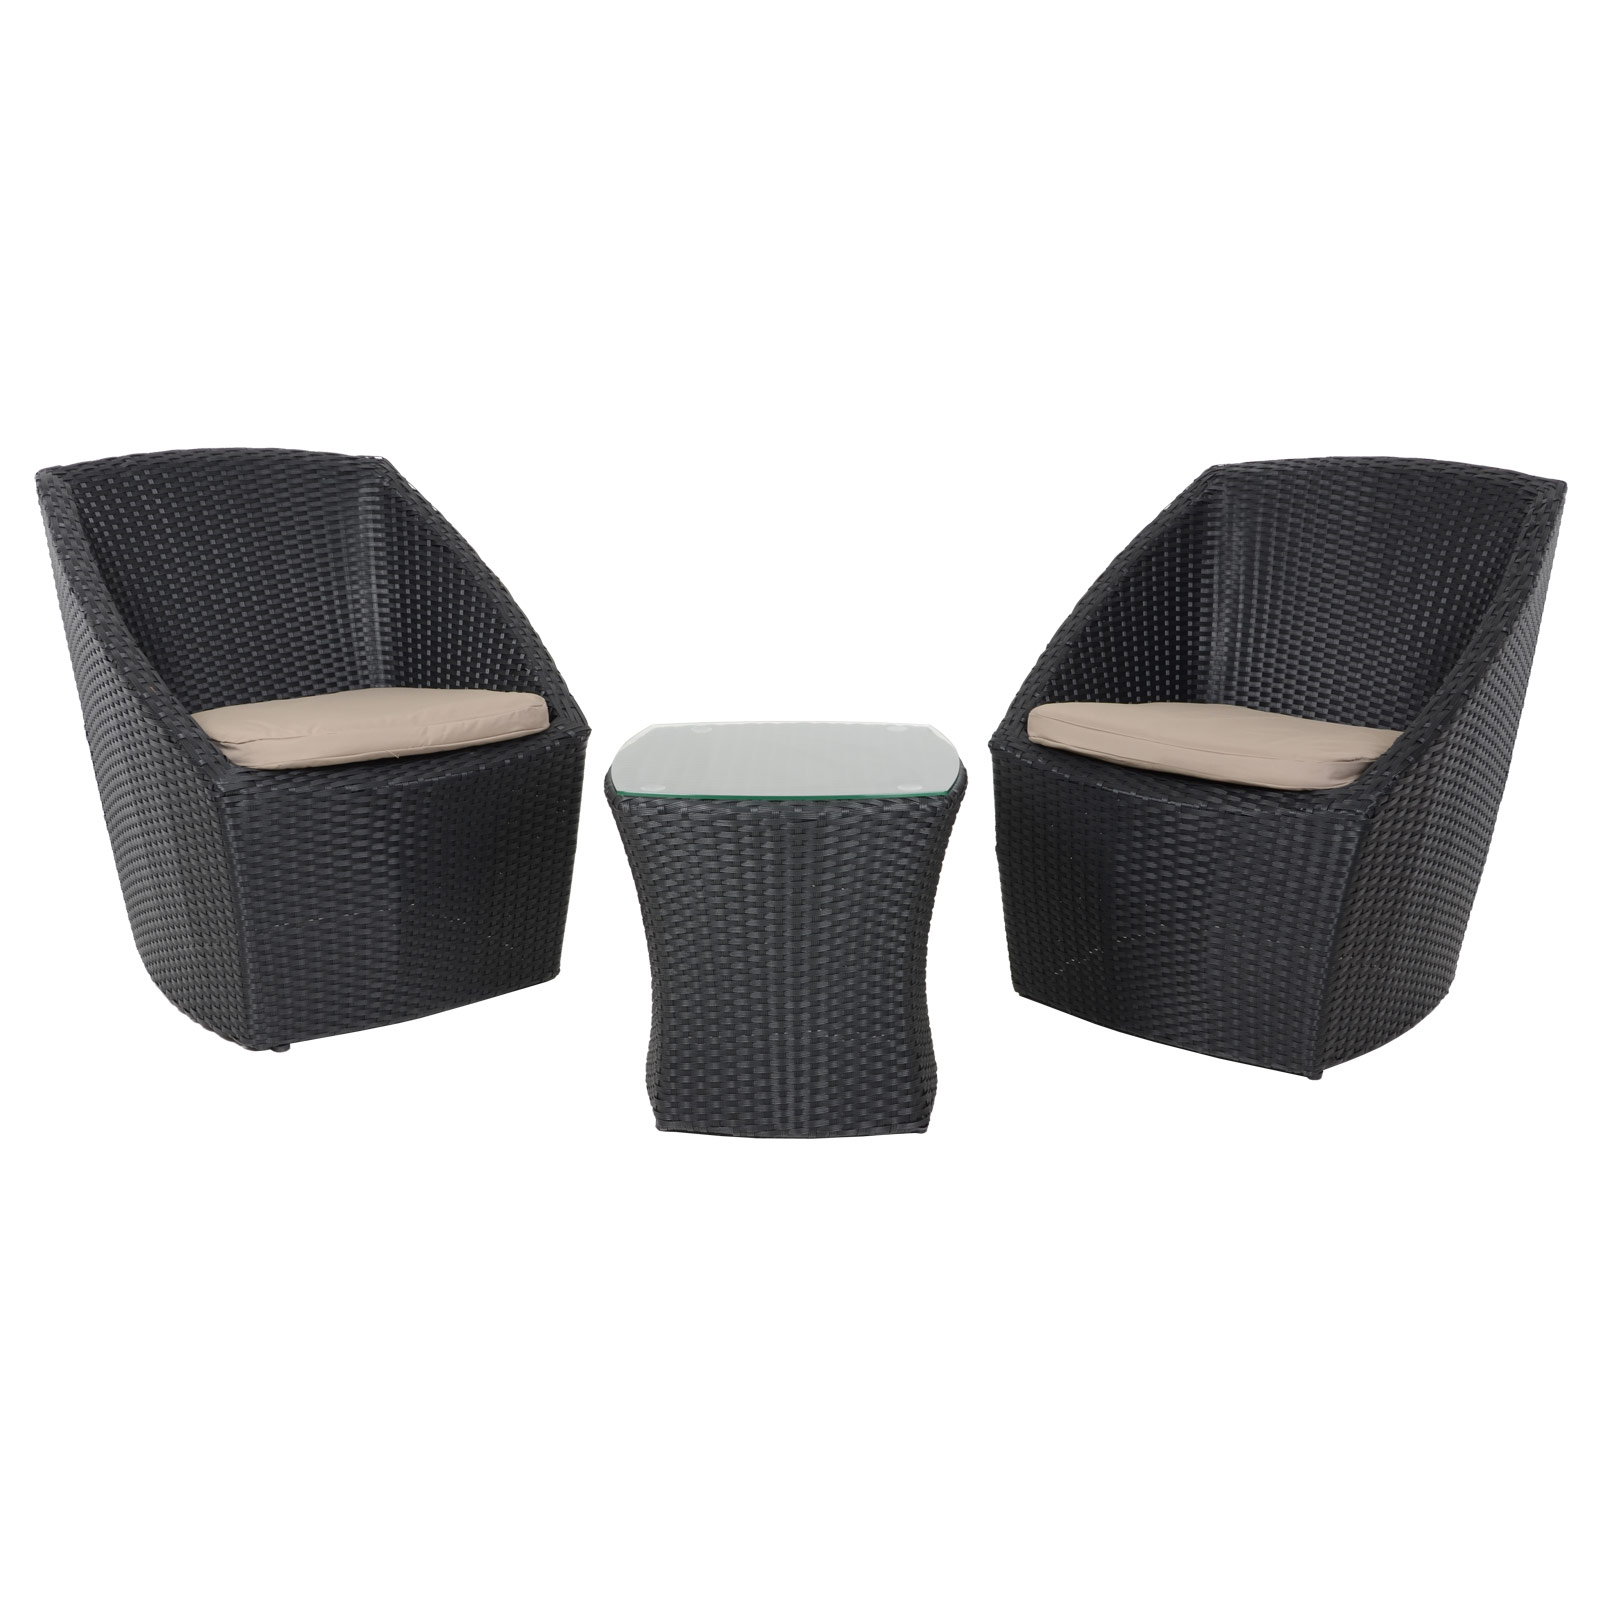 Lazio Rattan Wicker Garden Furniture Bistro Set With Coffee Table 2 Chairs Ebay